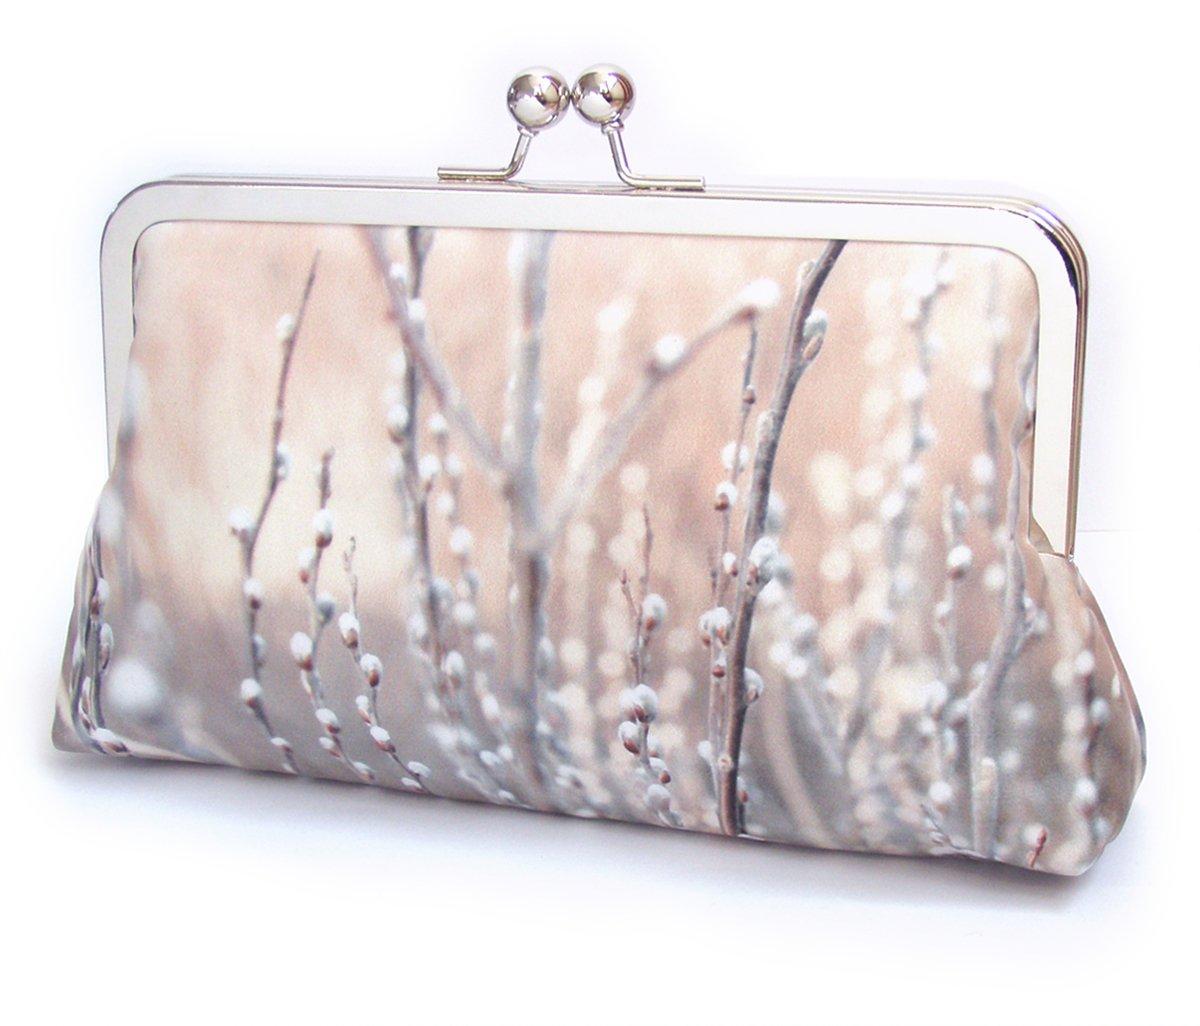 Image of Willow buds, silk clutch bag, blush pink pastel